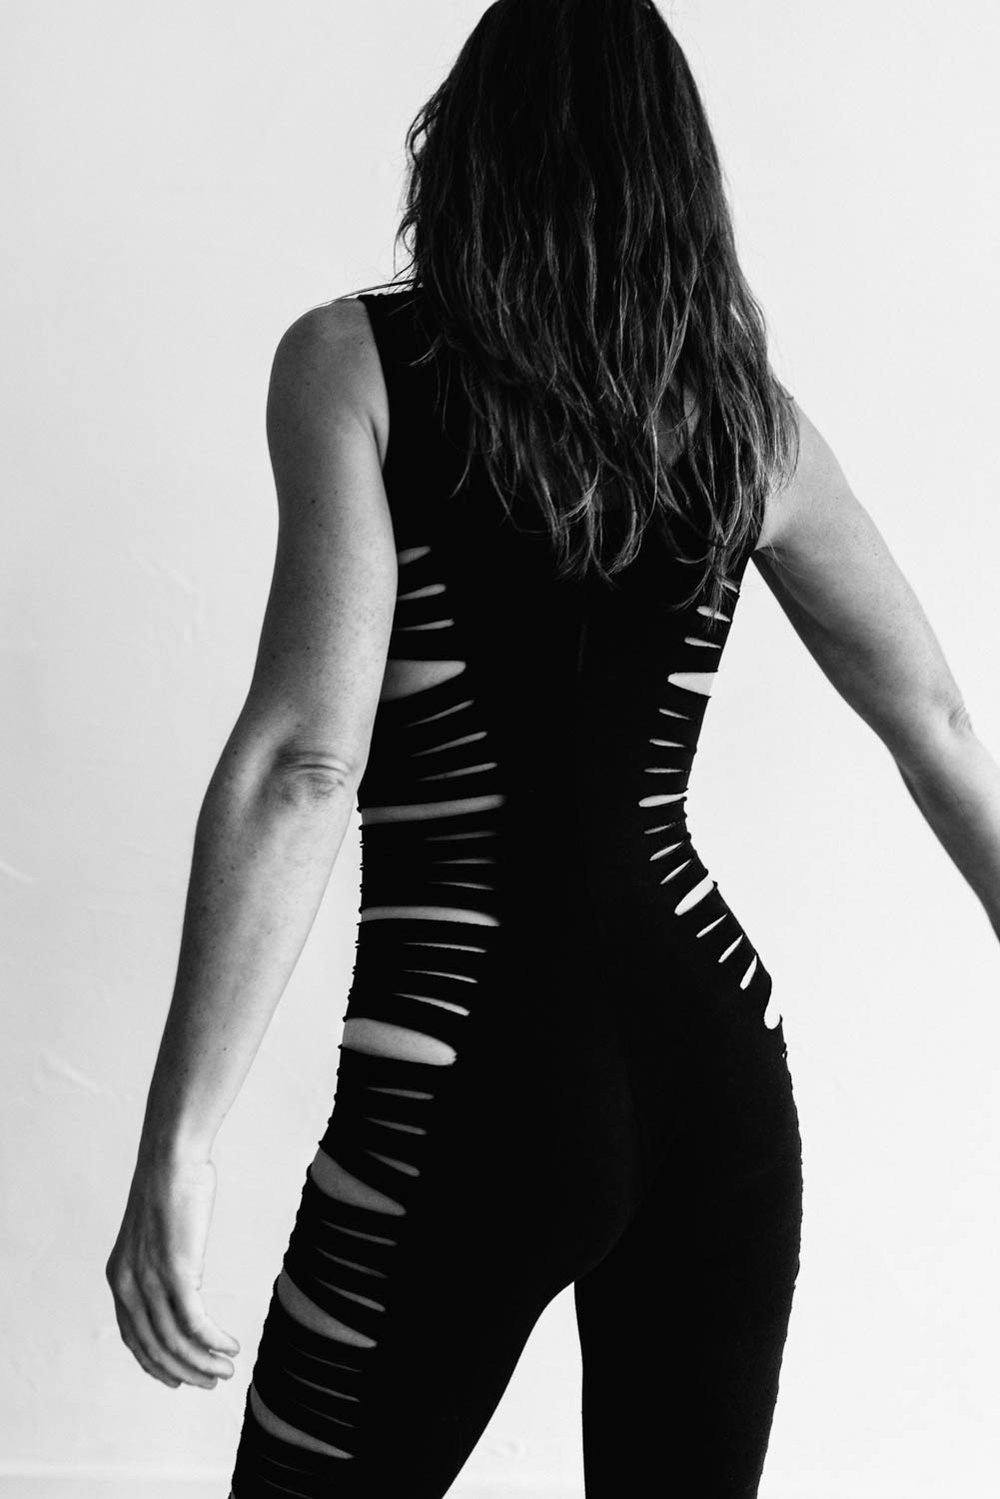 woman-yoga-pantsuit-from-behind-black-white-©Copyright-Elisabeth-Waller.jpg